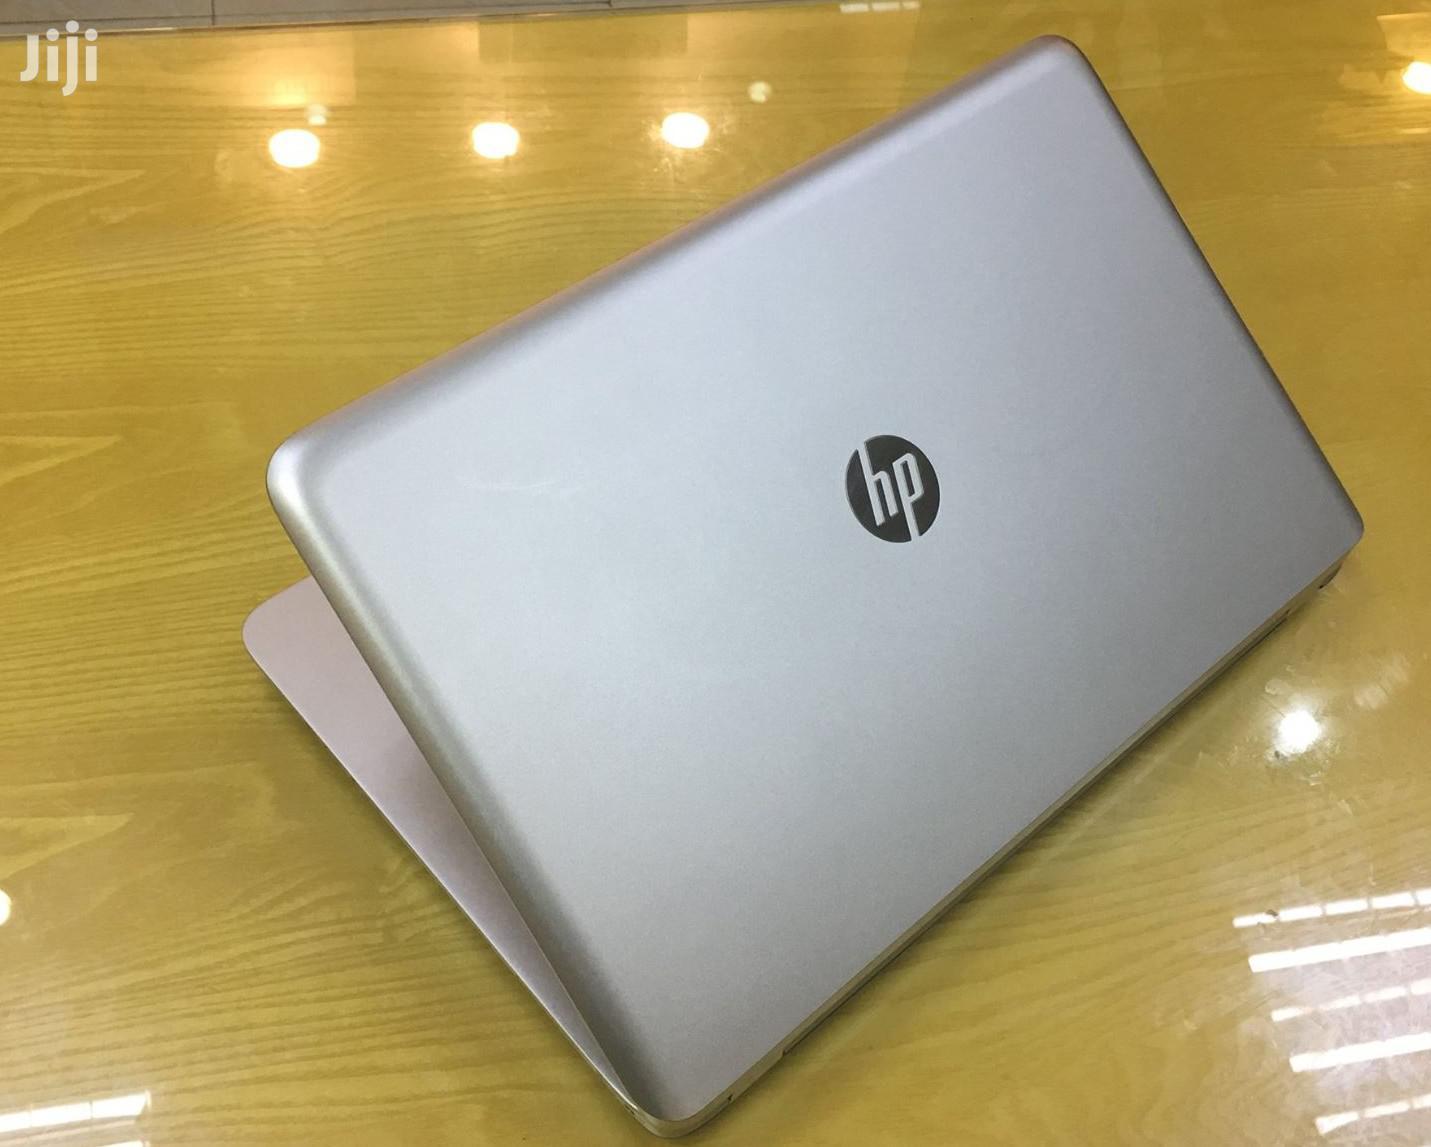 New Laptop HP EliteBook 8460P 4GB Intel Core i5 HDD 500GB | Laptops & Computers for sale in Nairobi Central, Nairobi, Kenya